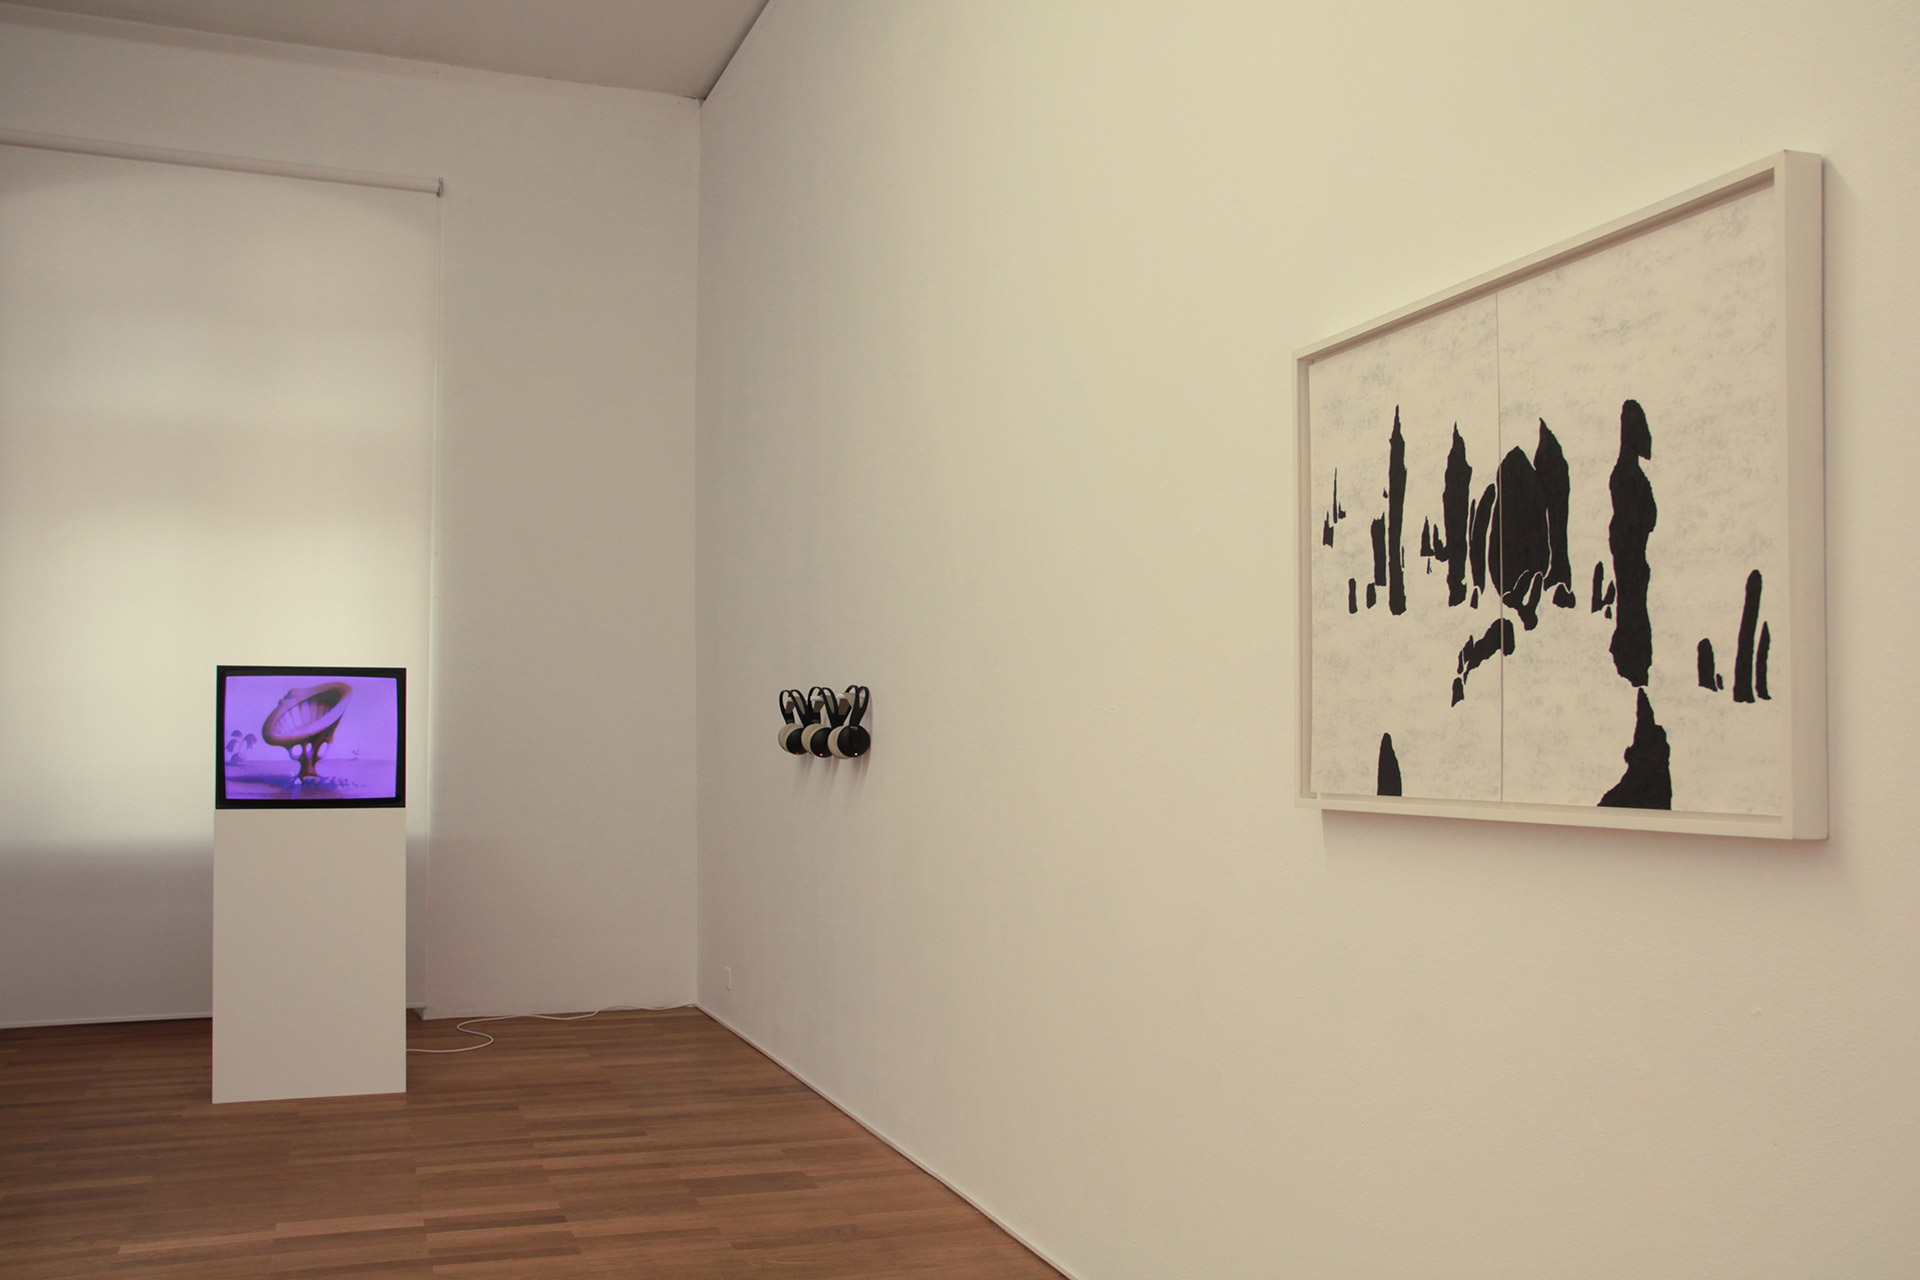 Kunsthalle-Winterthur-Salvatore-Arancio-4.jpg